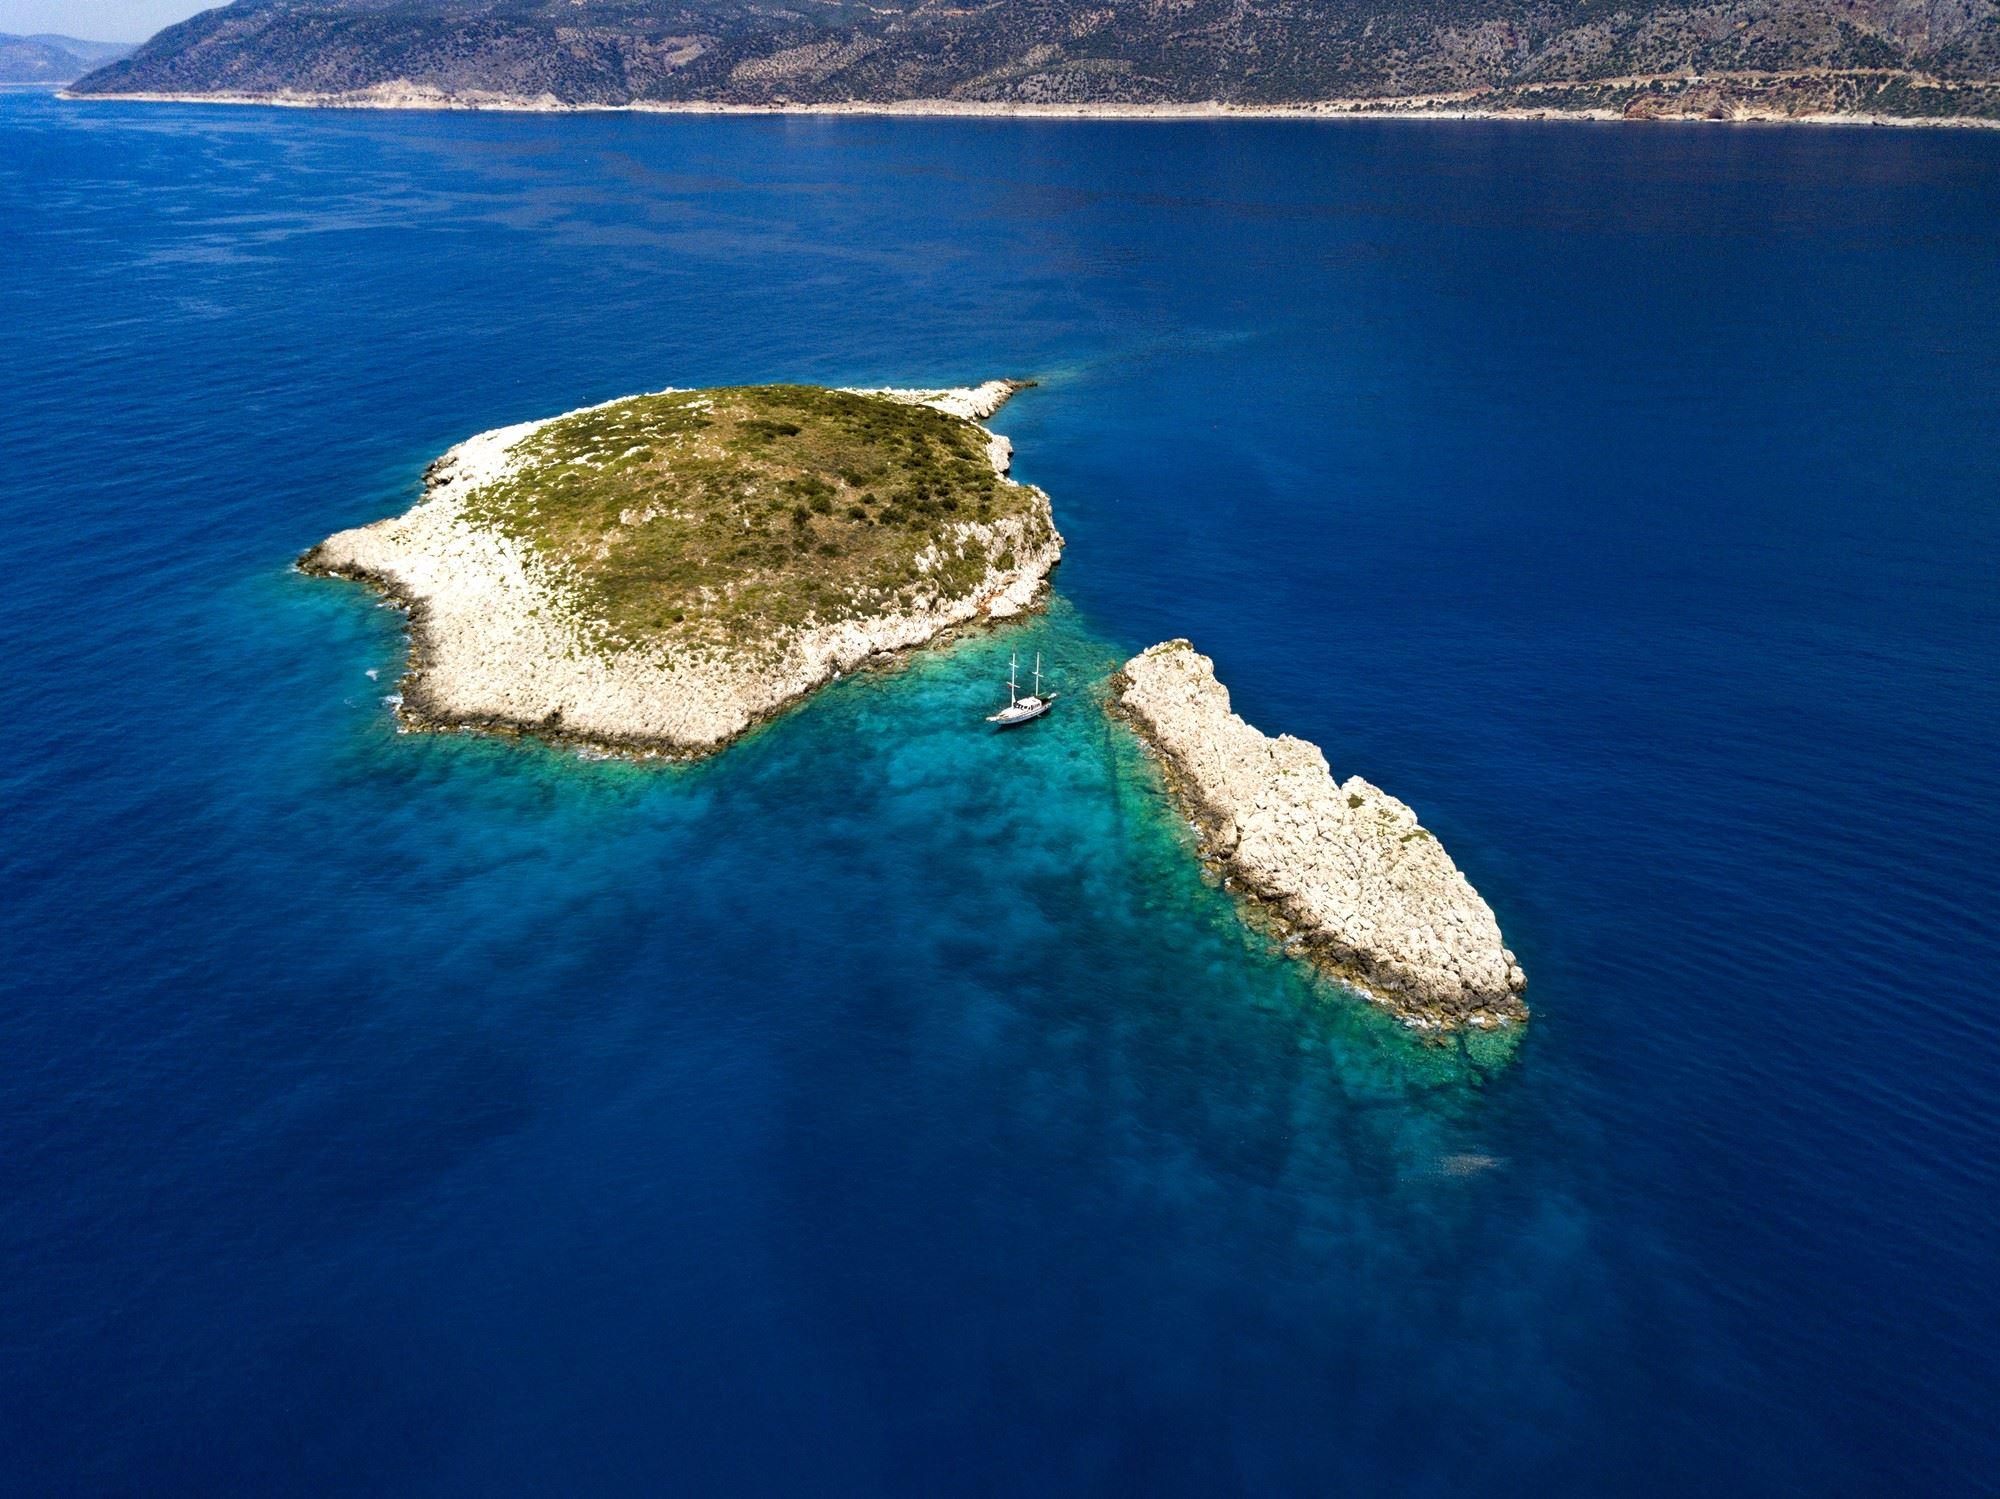 Luxury 2-3 night mini-cruises. Swim, sail, snorkel, scuba, sun, snooze or dream